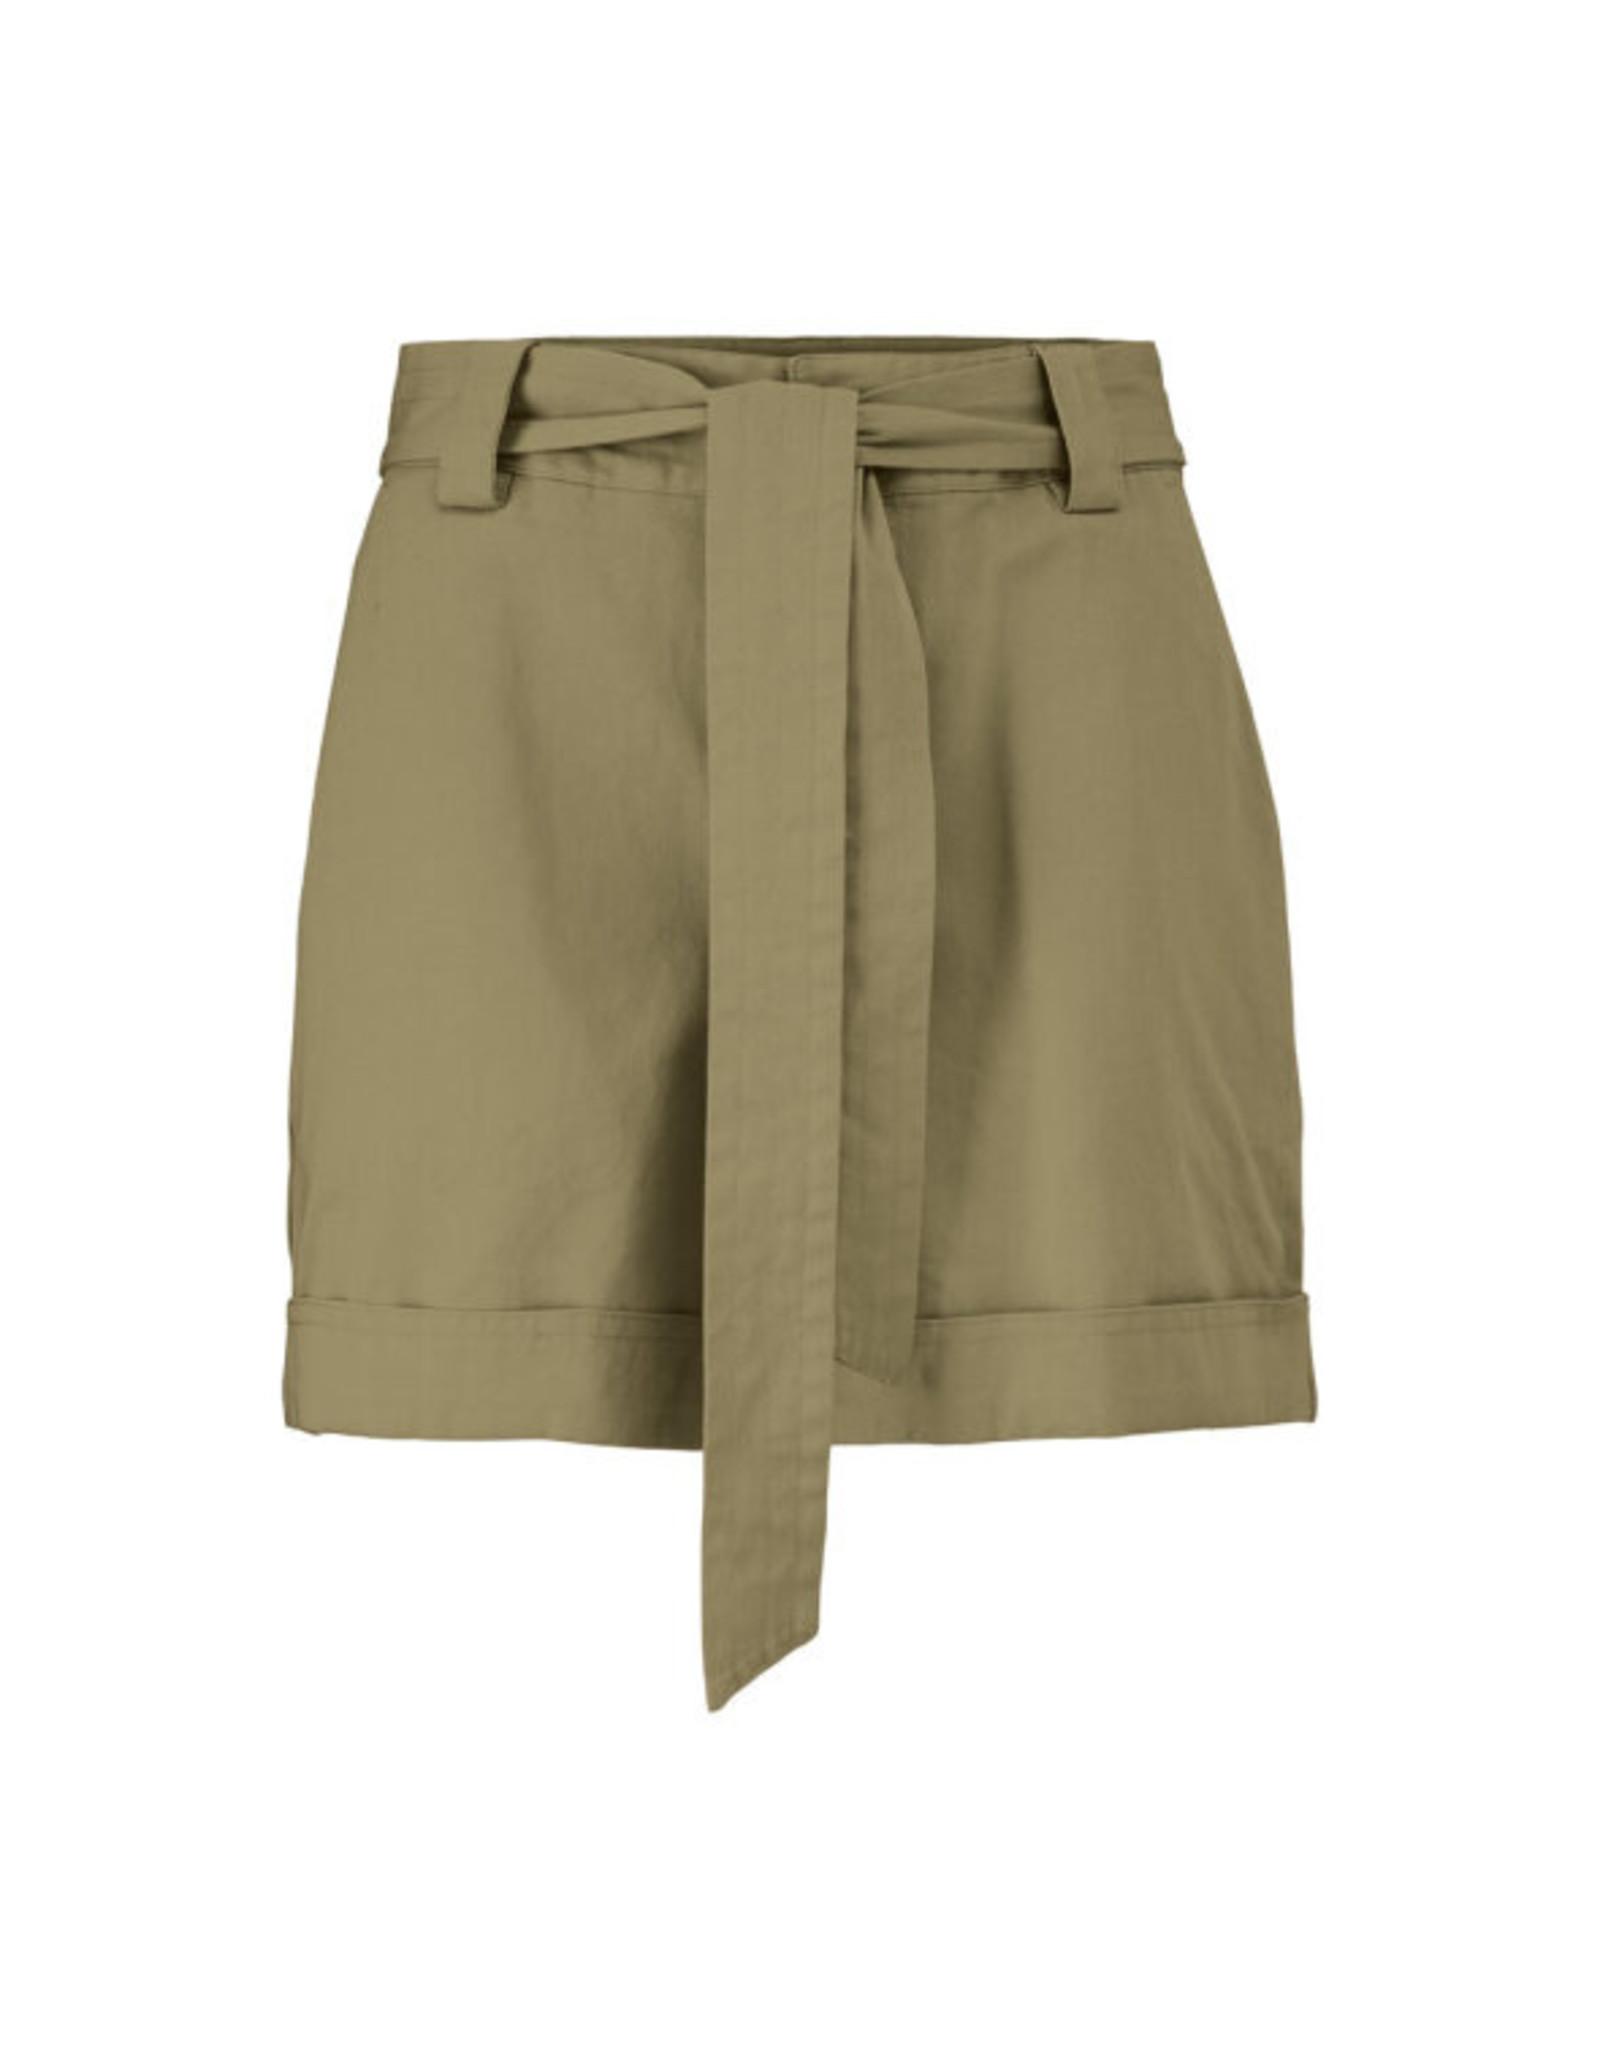 Modstrom Ivette Shorts Light Khaki